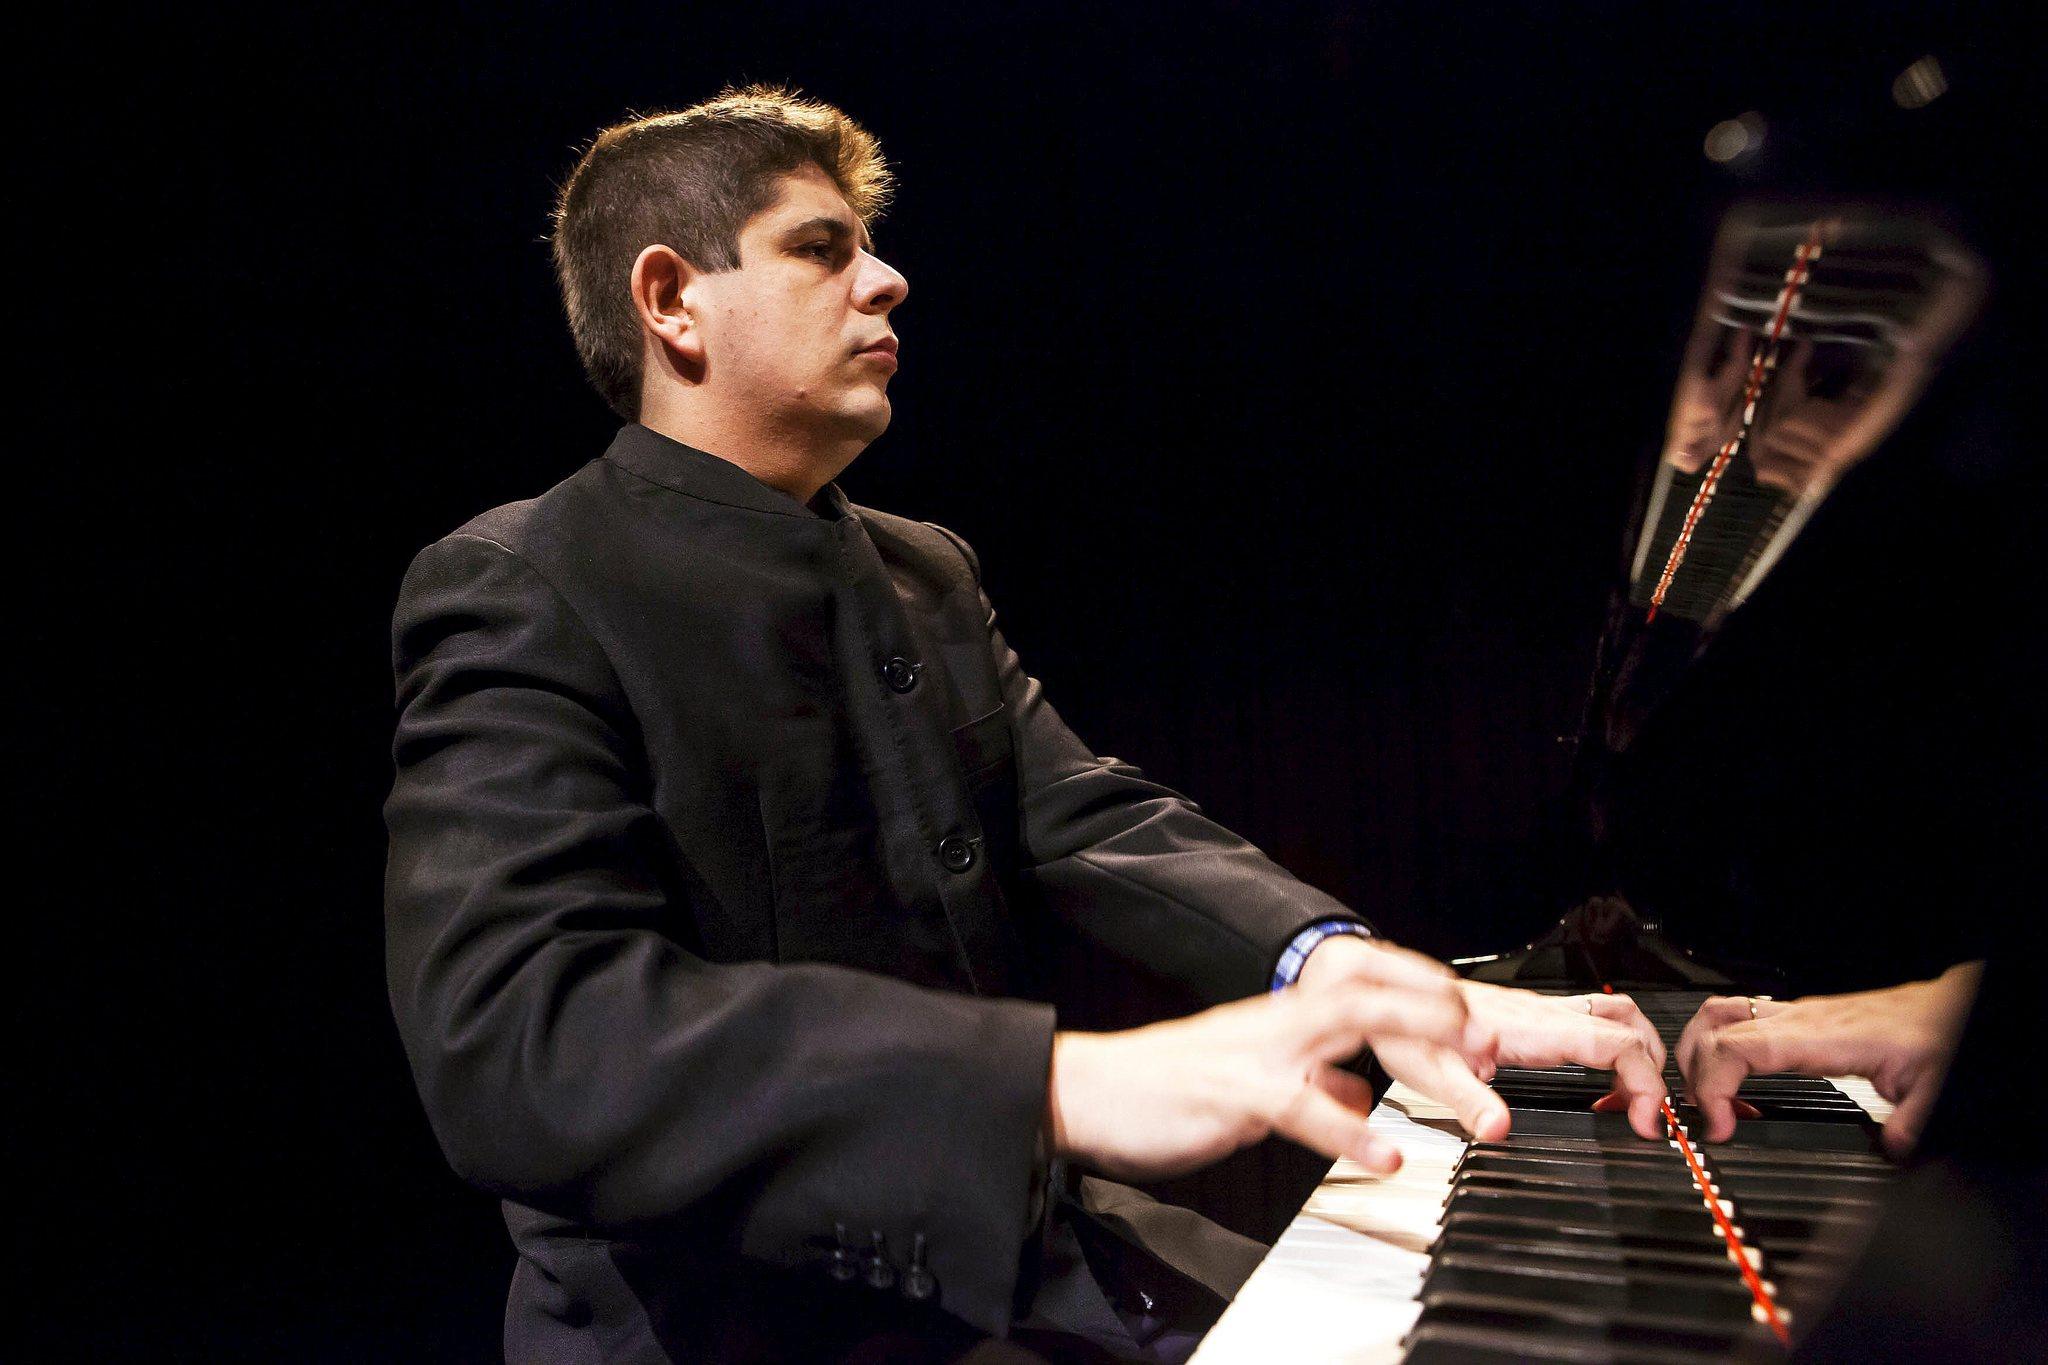 Zubin Mehta inaugura el Festival de Baden-Baden con Otello